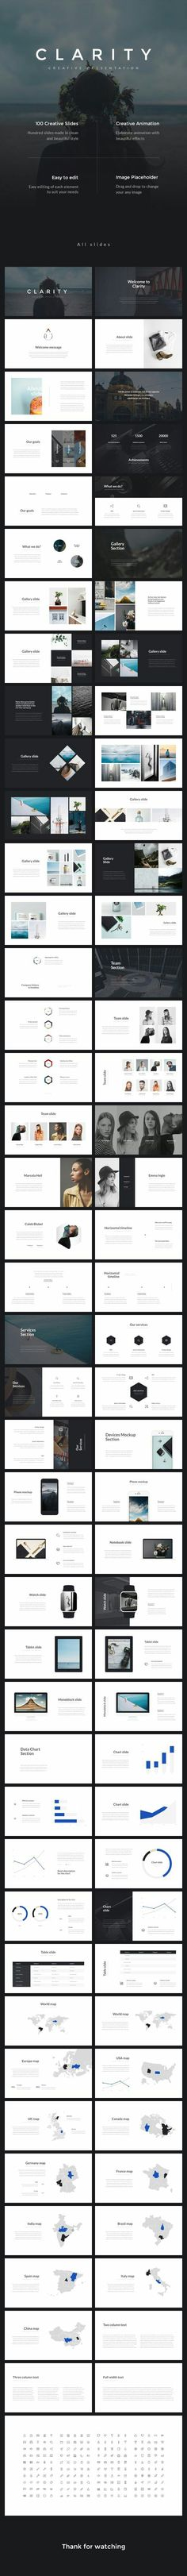 Business infographic : Clarity Keynote Presentation Keynote KEY Available here Keynote Presentation, Design Presentation, Presentation Templates, Presentation Slides, Keynote Design, Pag Web, Creative Powerpoint, Slide Design, Grafik Design